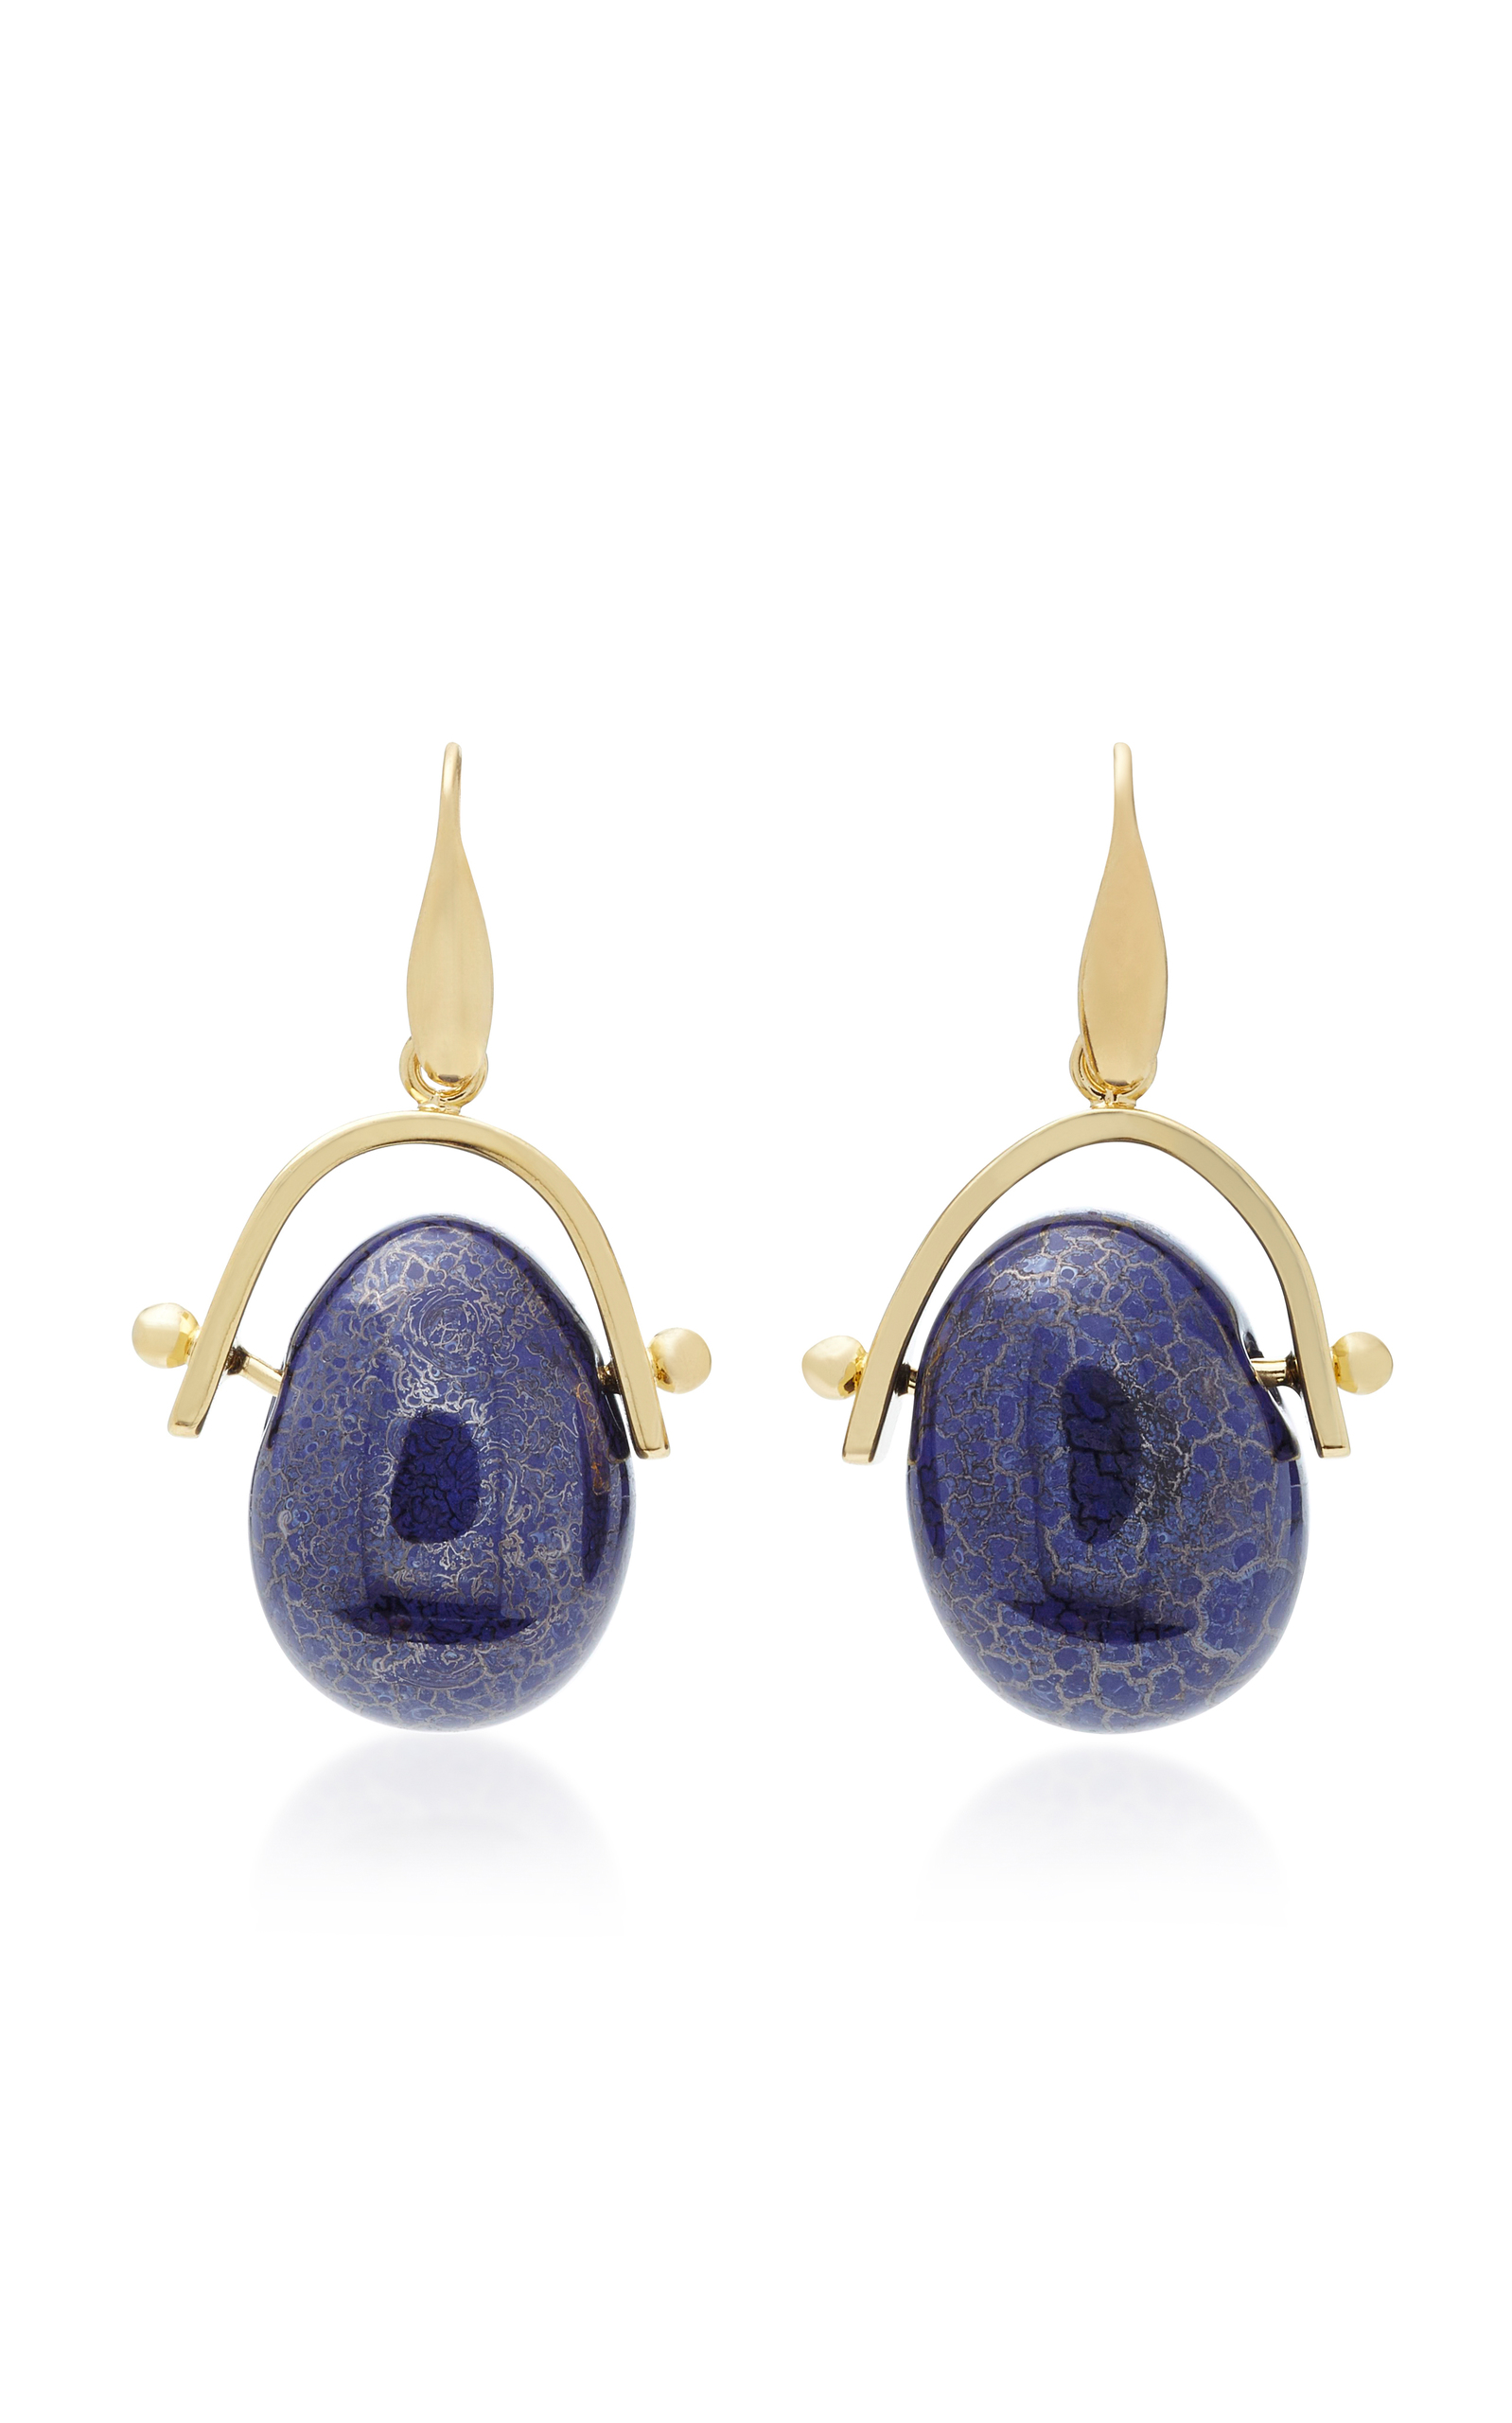 Gold-Tone Brass Pebble Earrings Isabel Marant 0FOnlQmfw